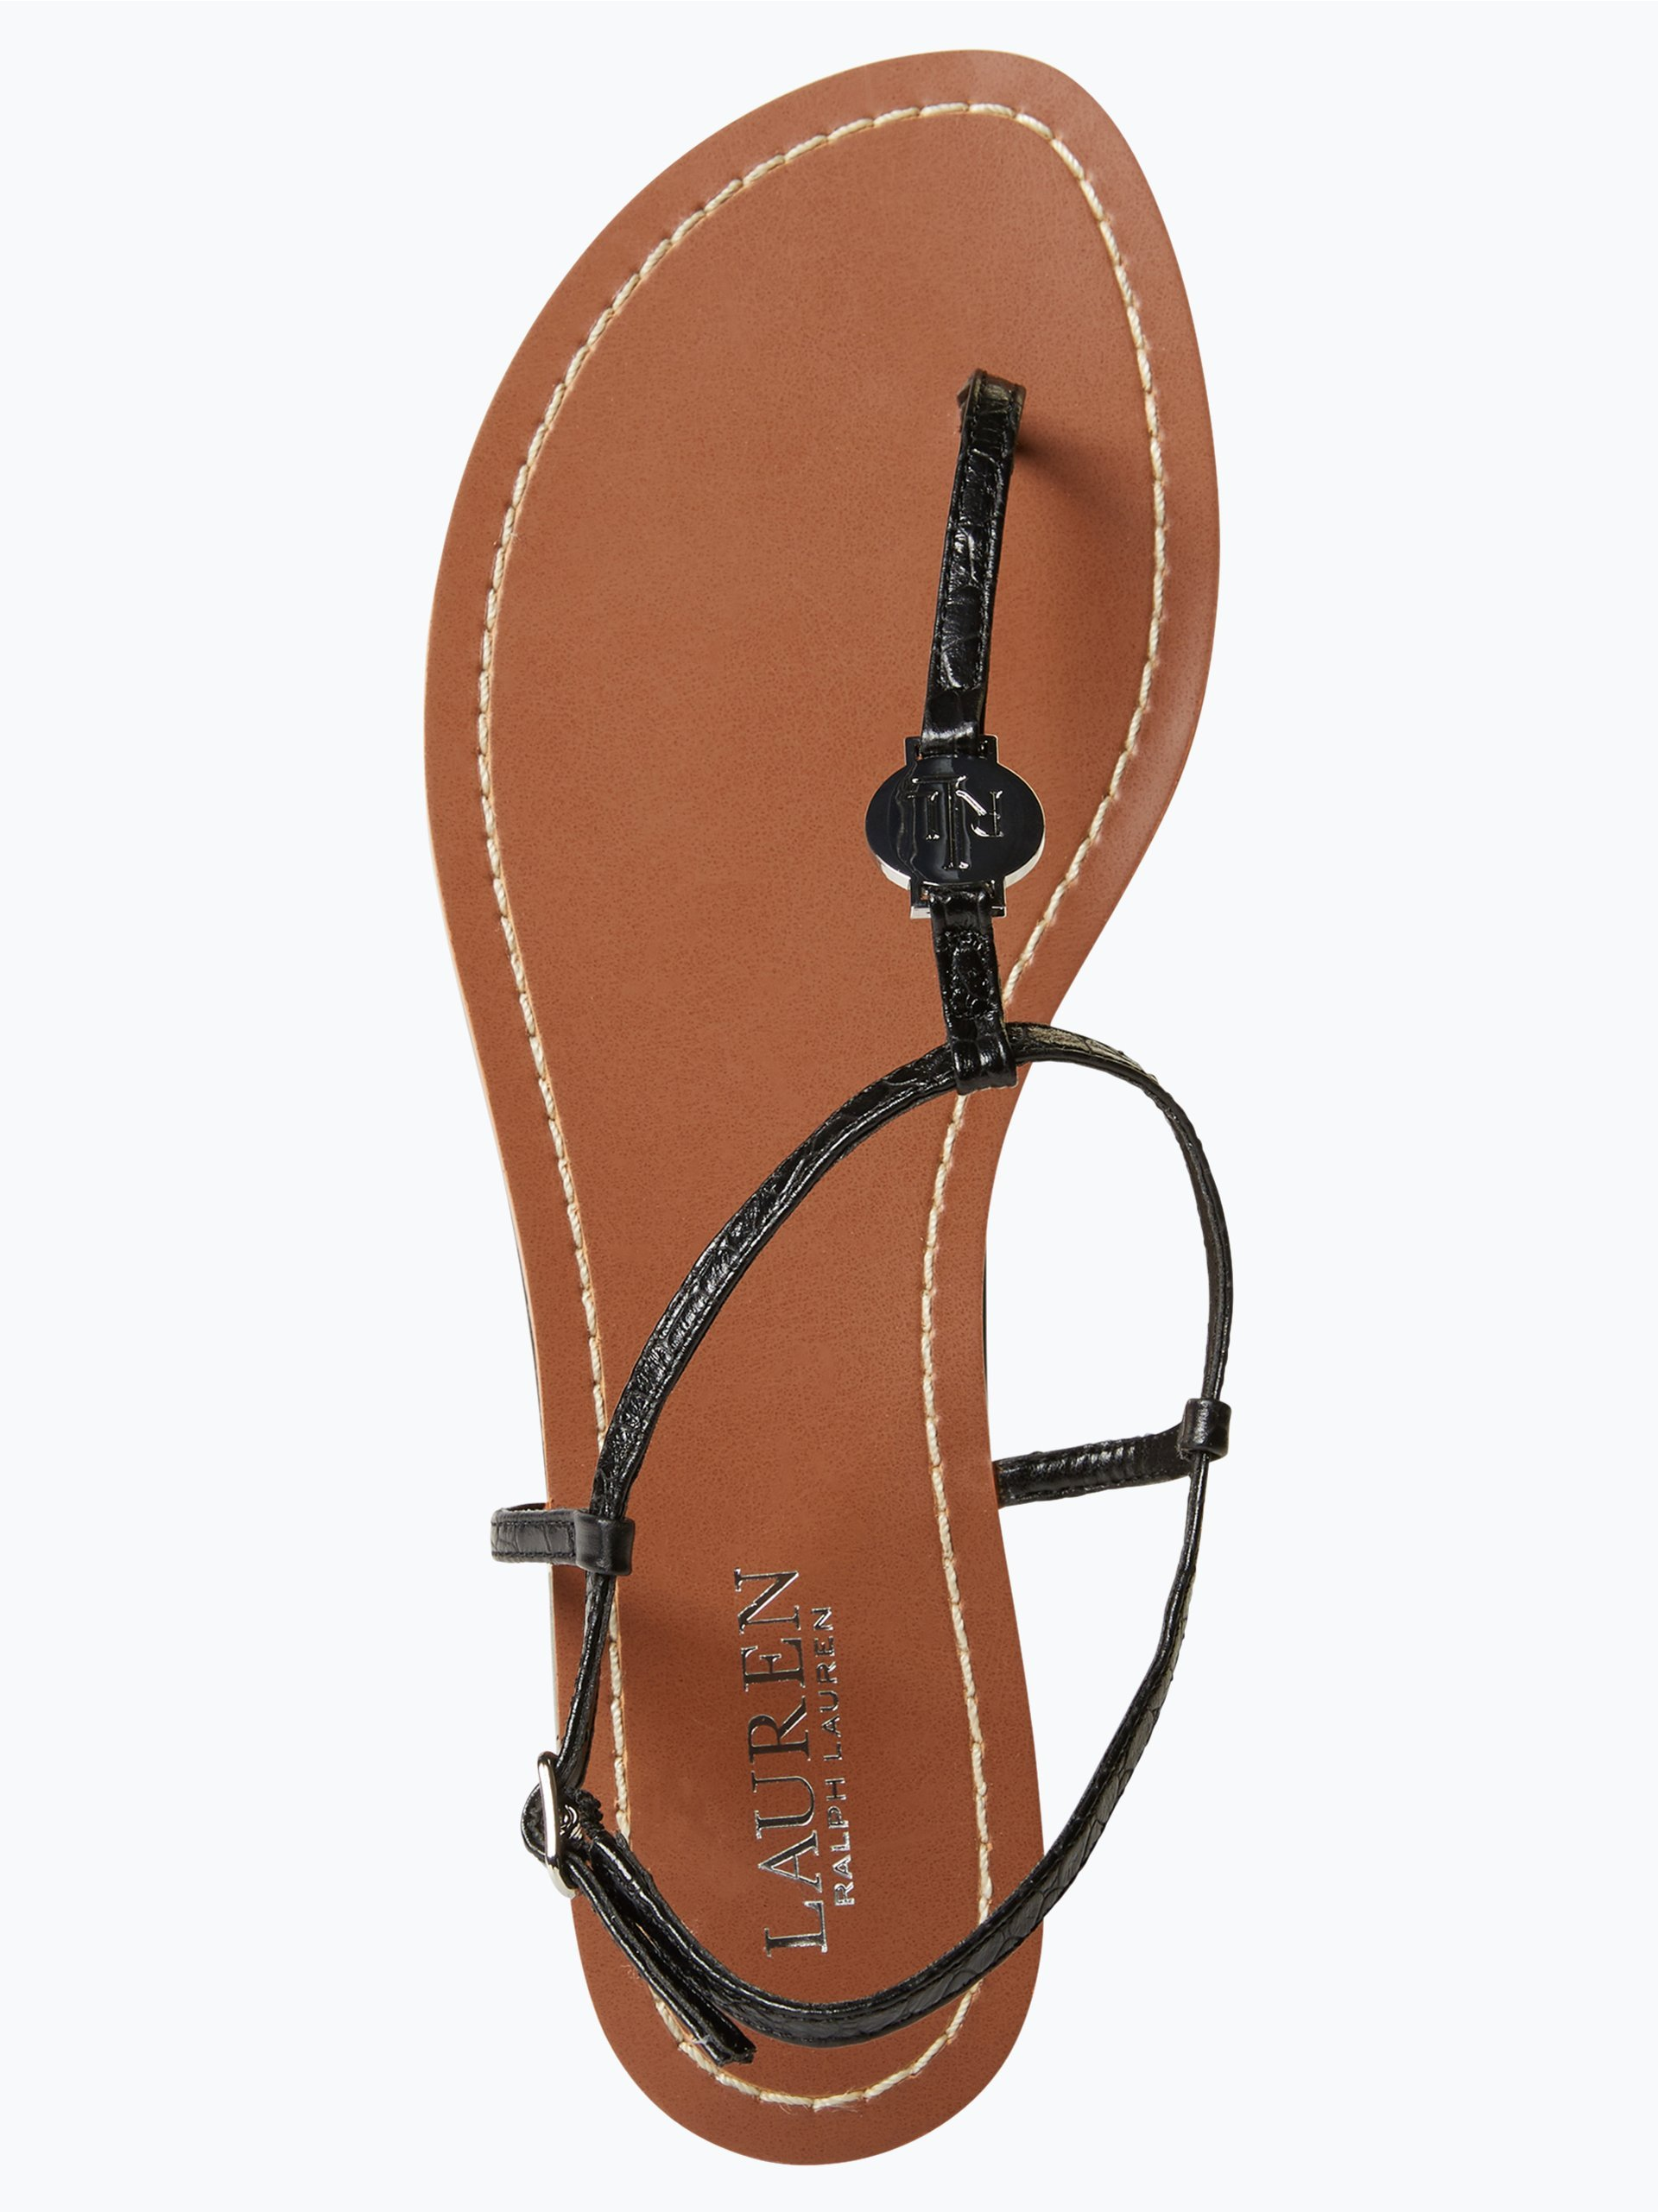 lauren damen sandalen aus leder schwarz uni online kaufen. Black Bedroom Furniture Sets. Home Design Ideas